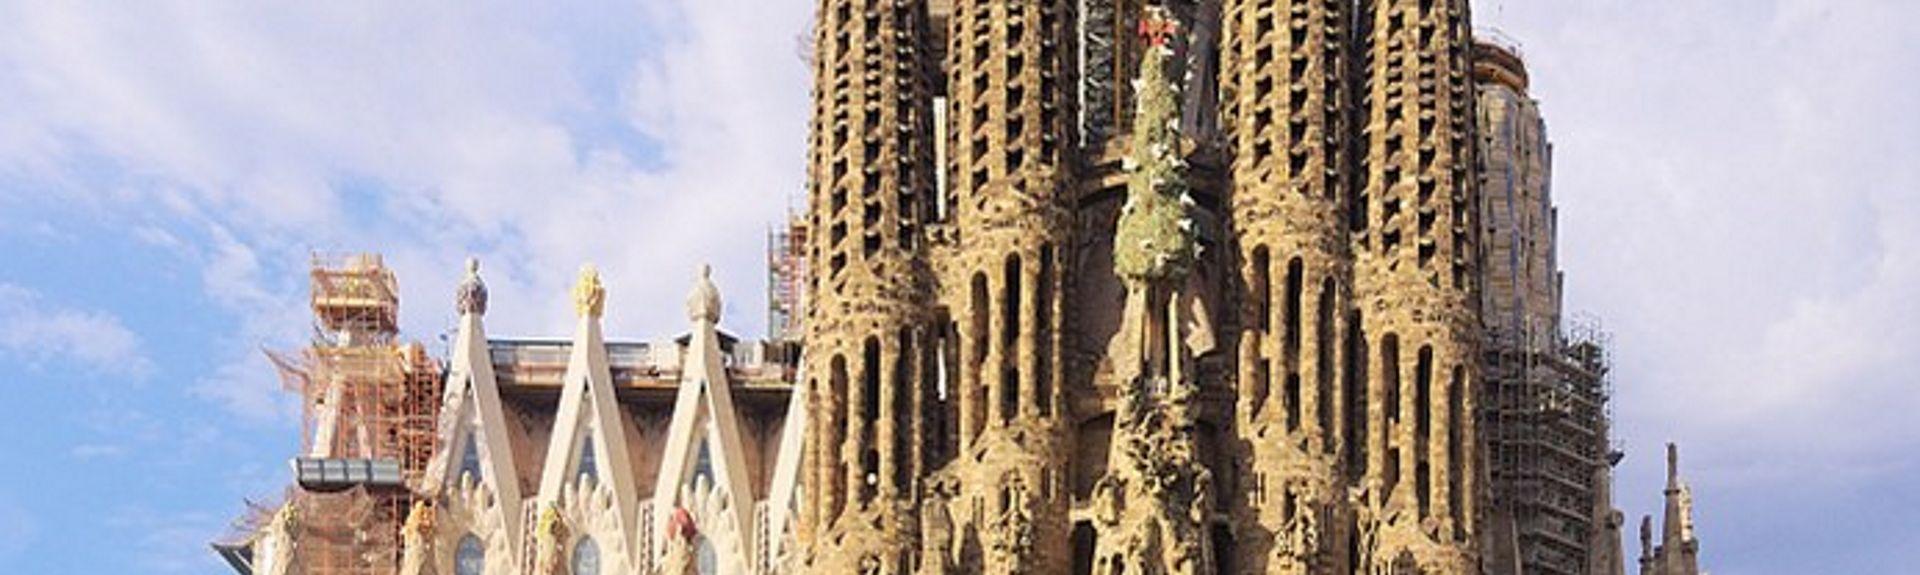 Santa Maria de l'Avall, Barcelona, Spain